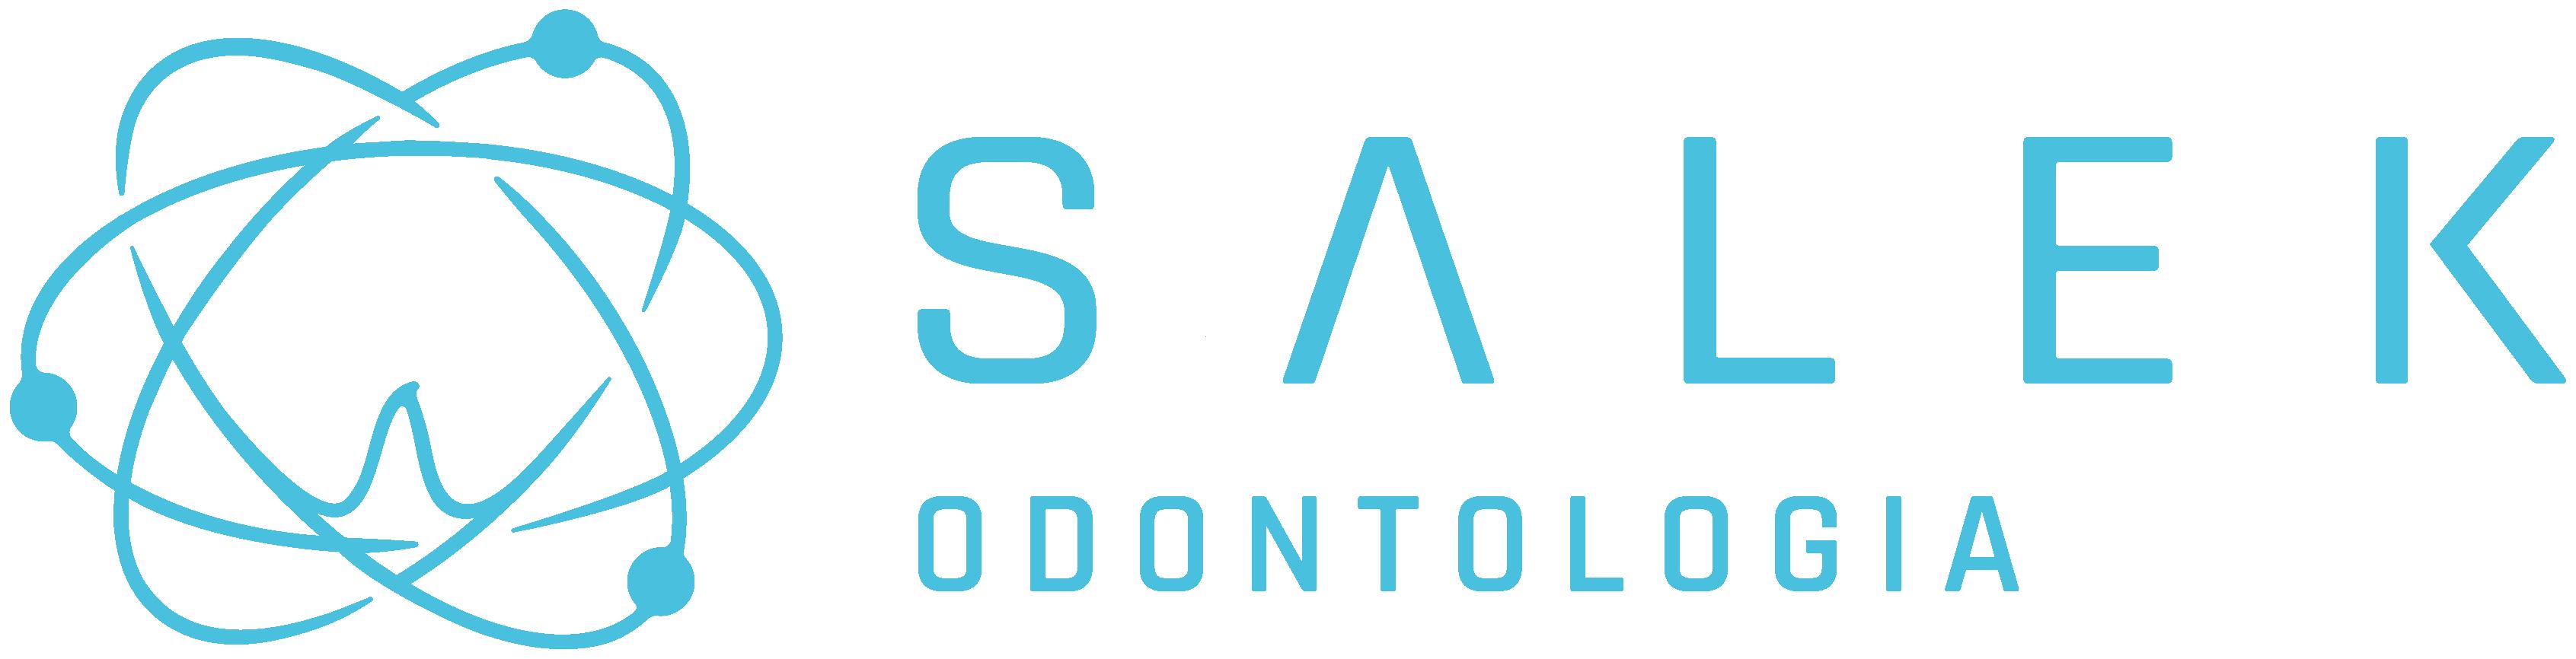 Salek Odontologia